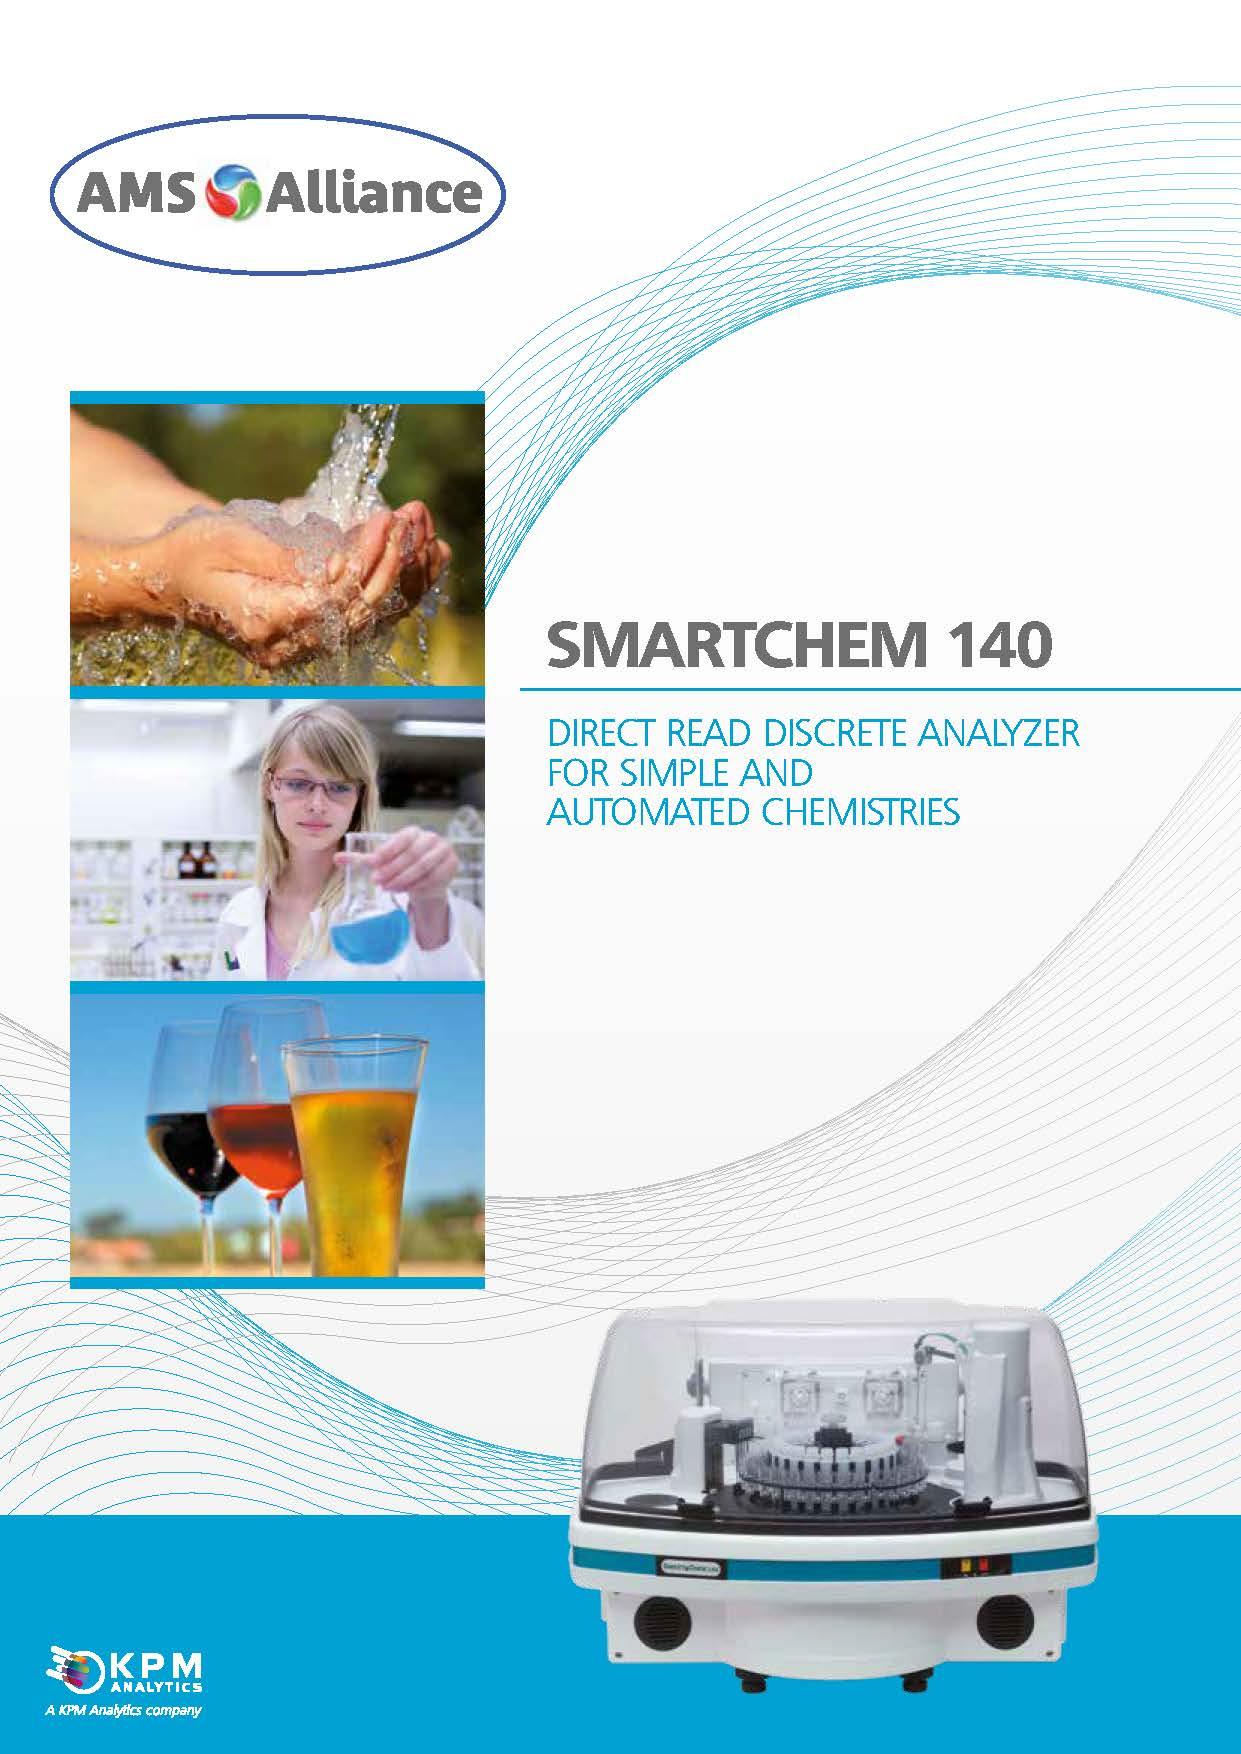 Smartchem 140